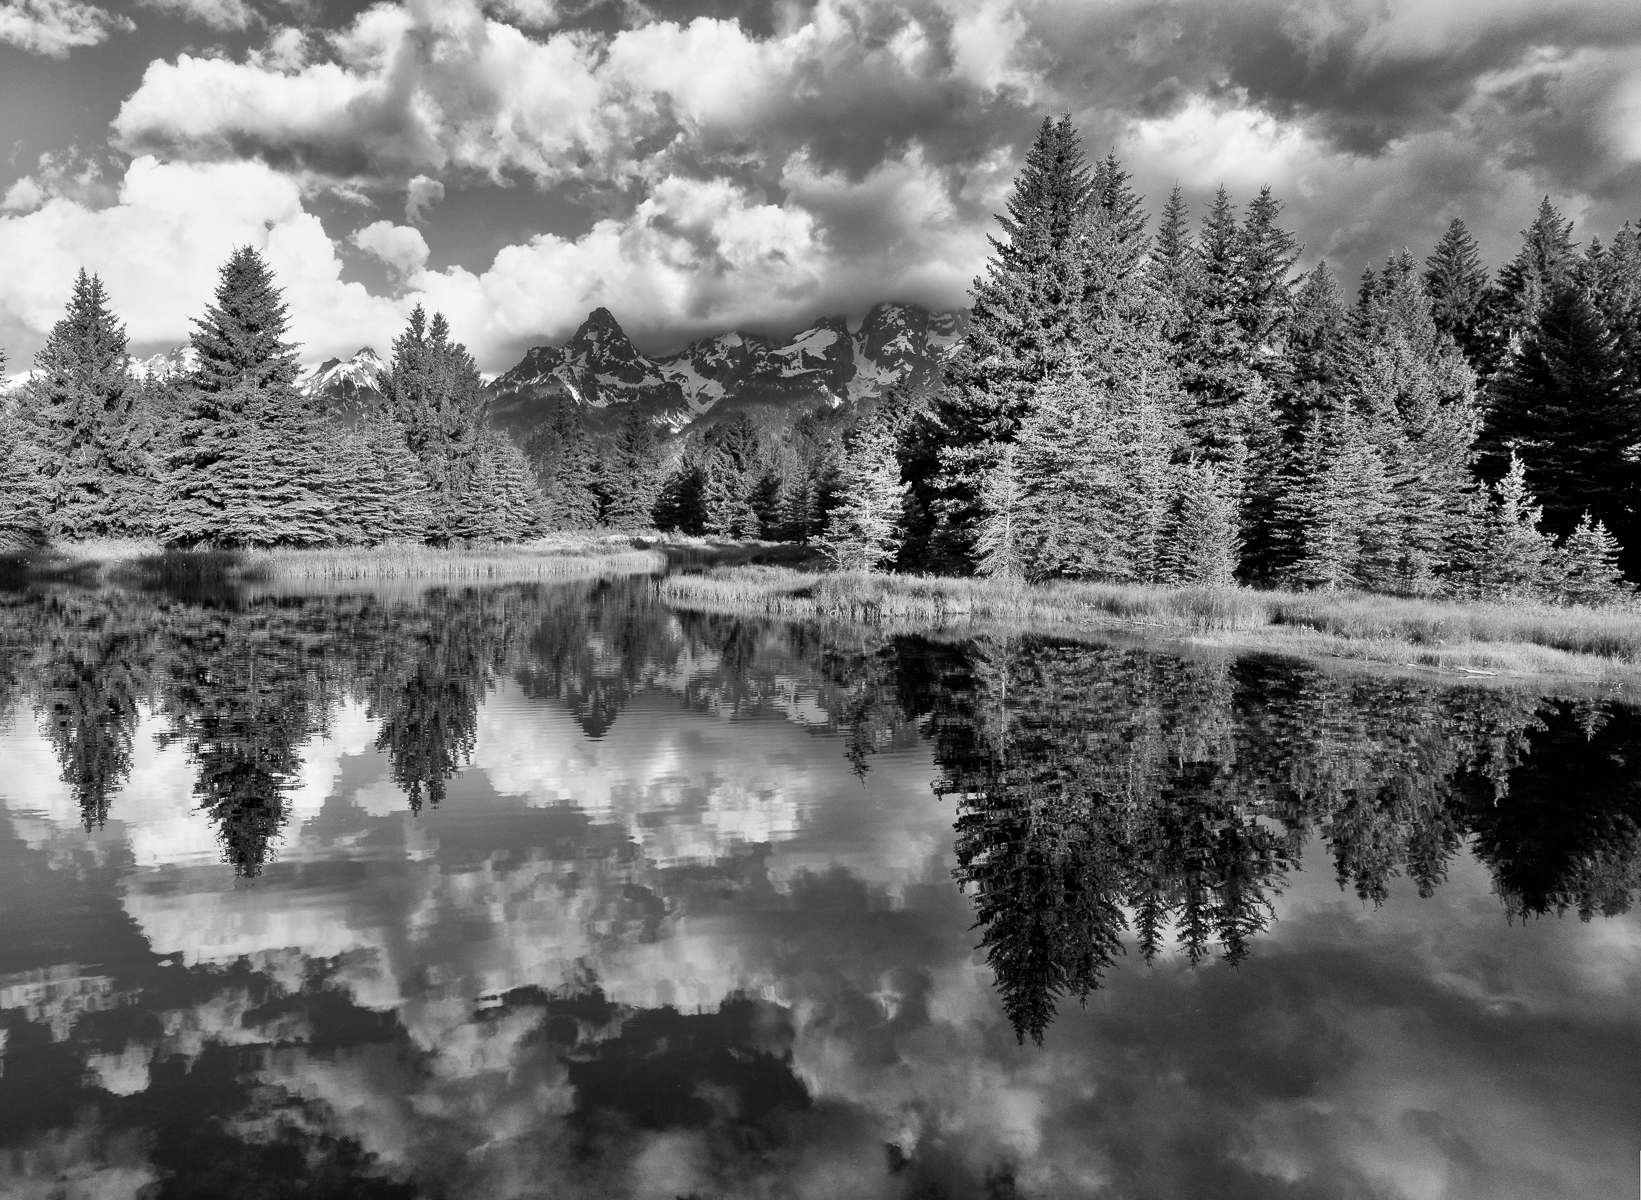 Grand Teton 2011-00587-00592-00597 pano.jpg